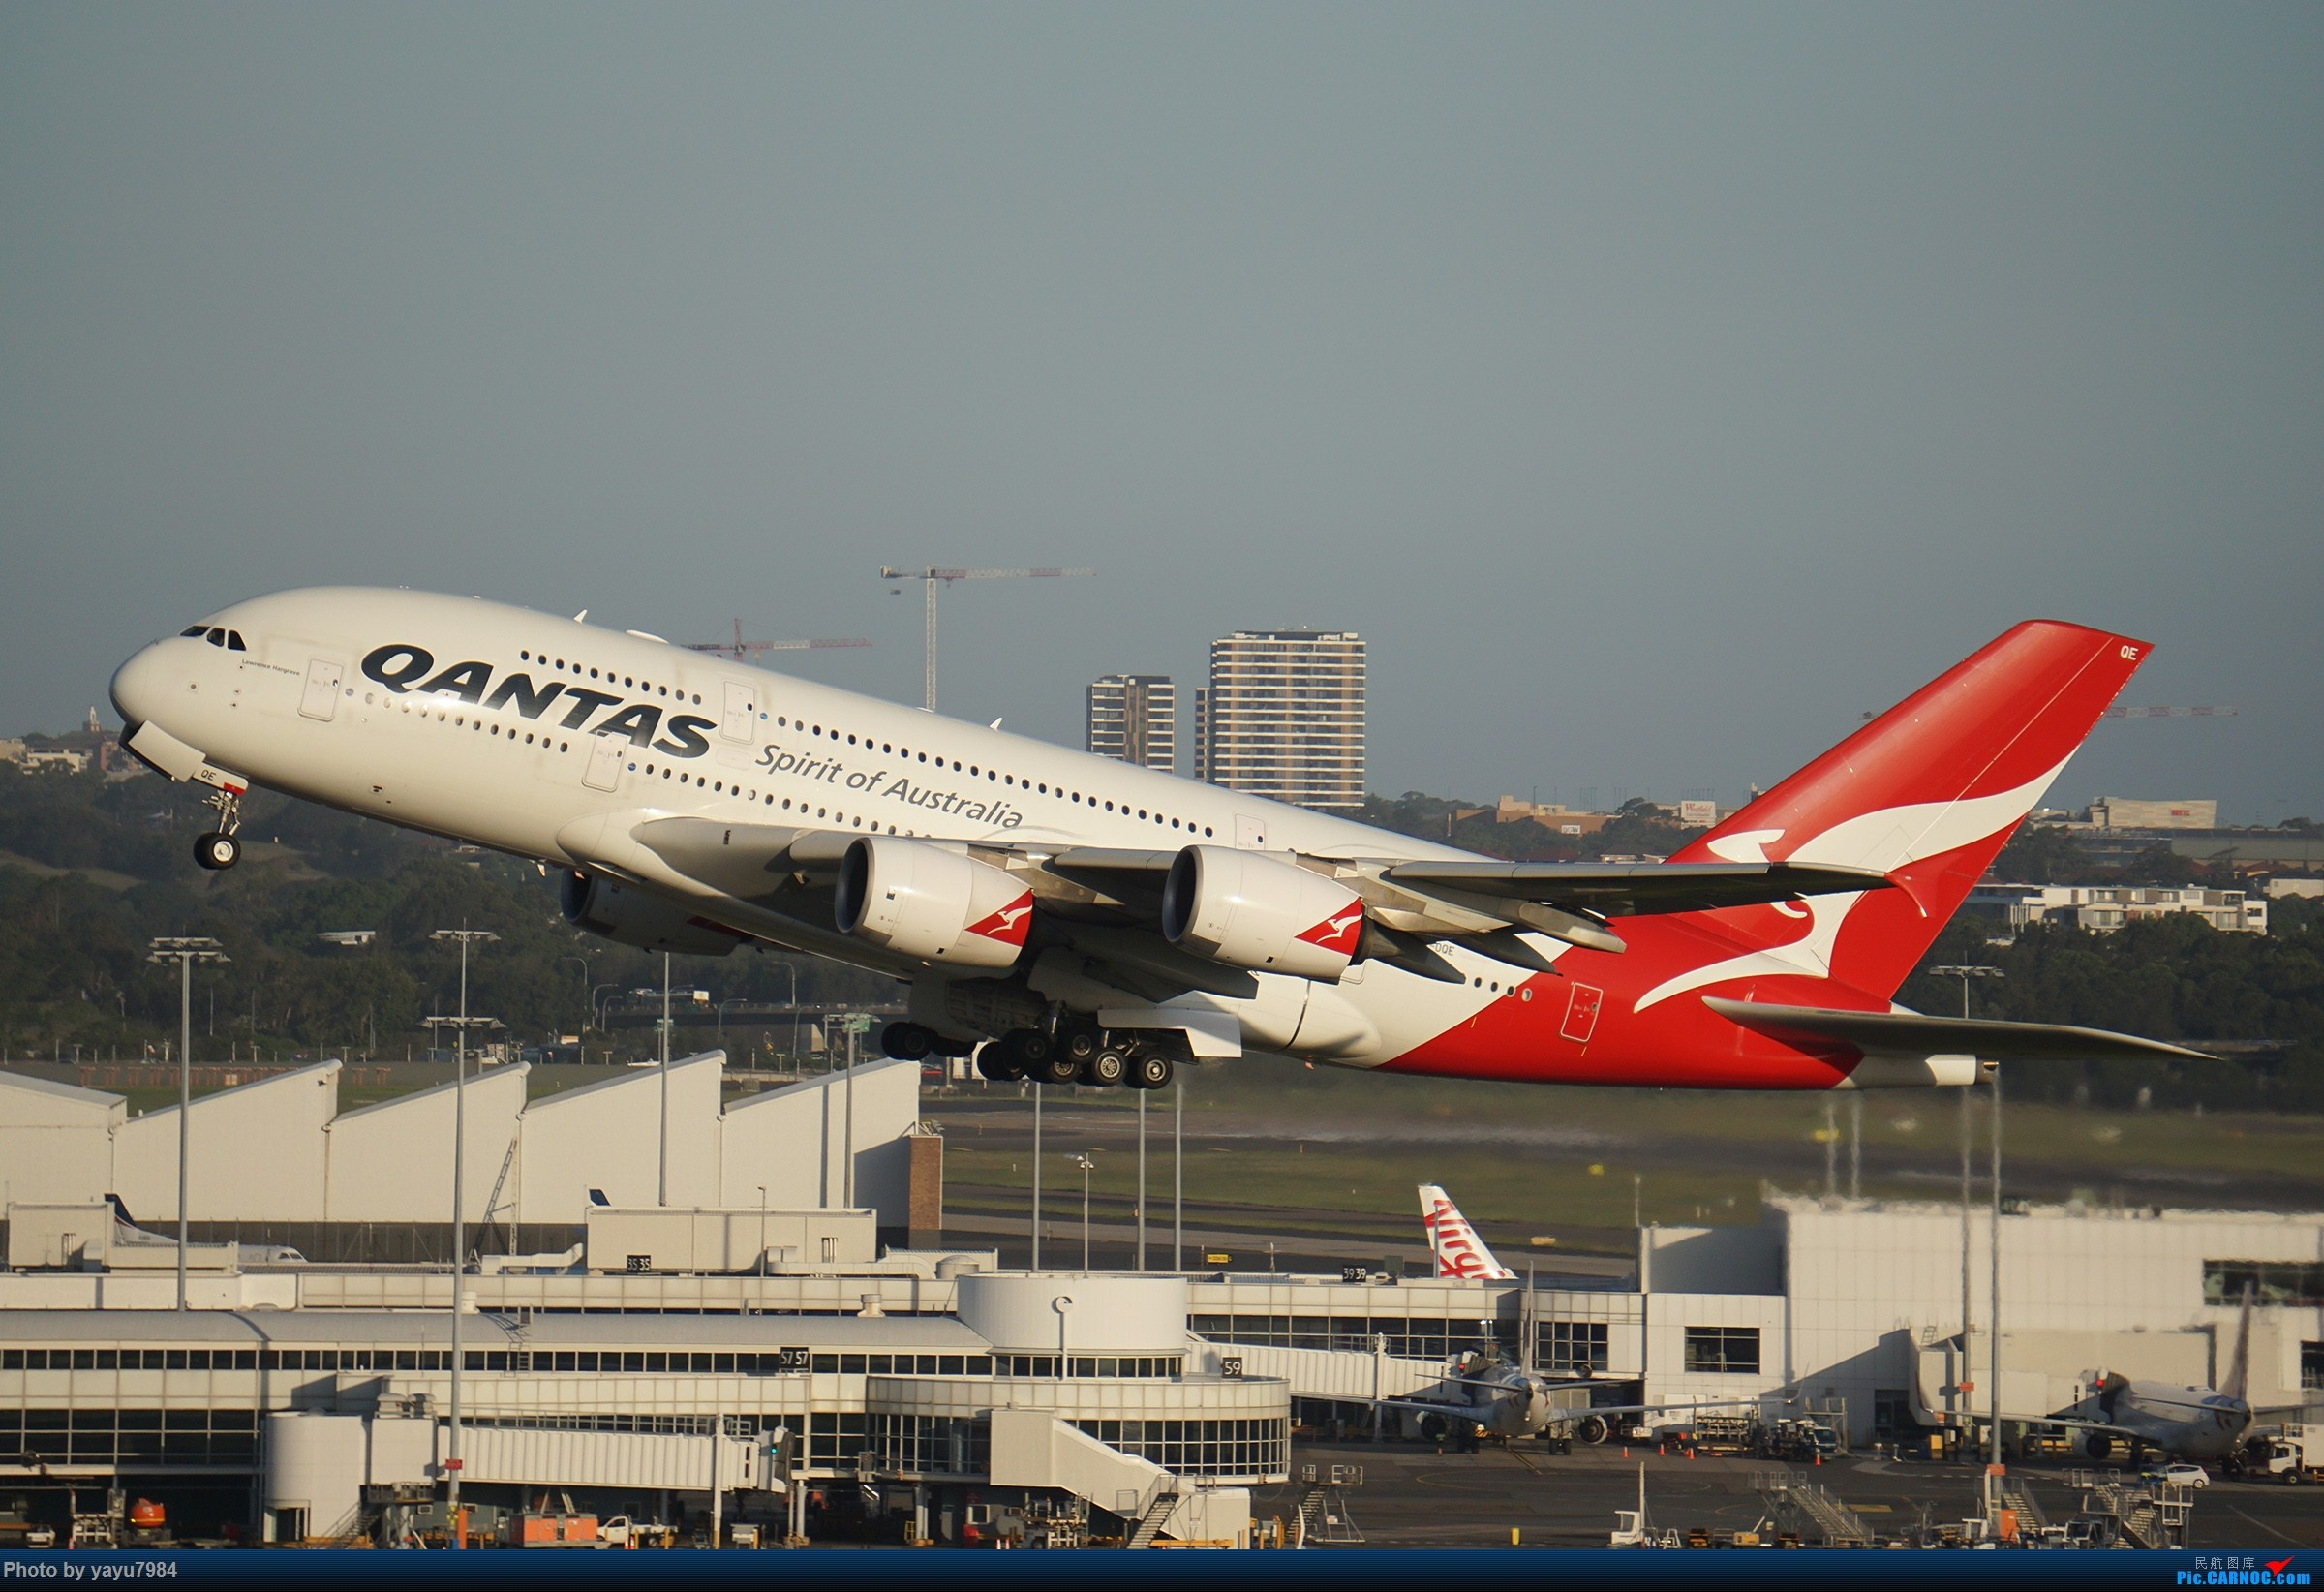 Re:[原创][SYD] 2019首拍,停车楼视角 AIRBUS A380-842 VH-OQE 澳大利亚悉尼金斯福德·史密斯机场